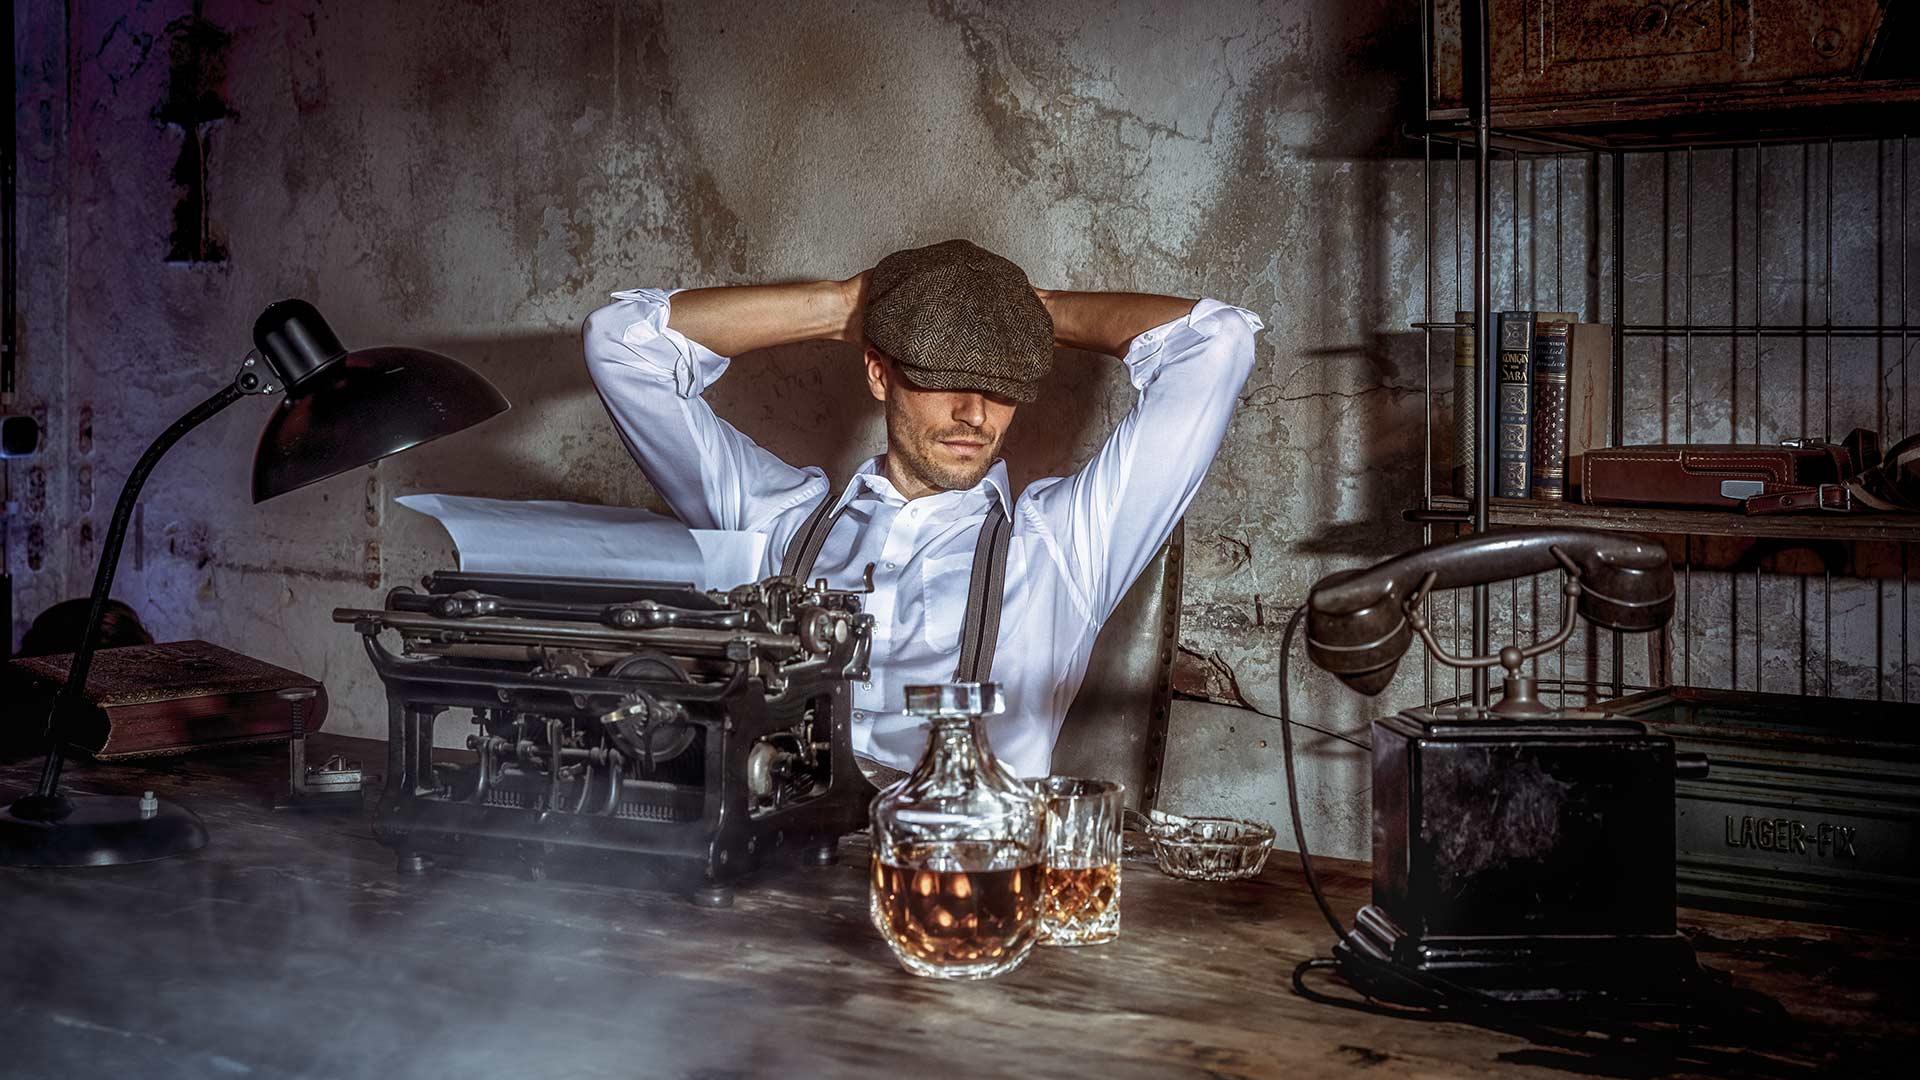 Film Noir Fotoshooting: Motiv Privatdetektiv